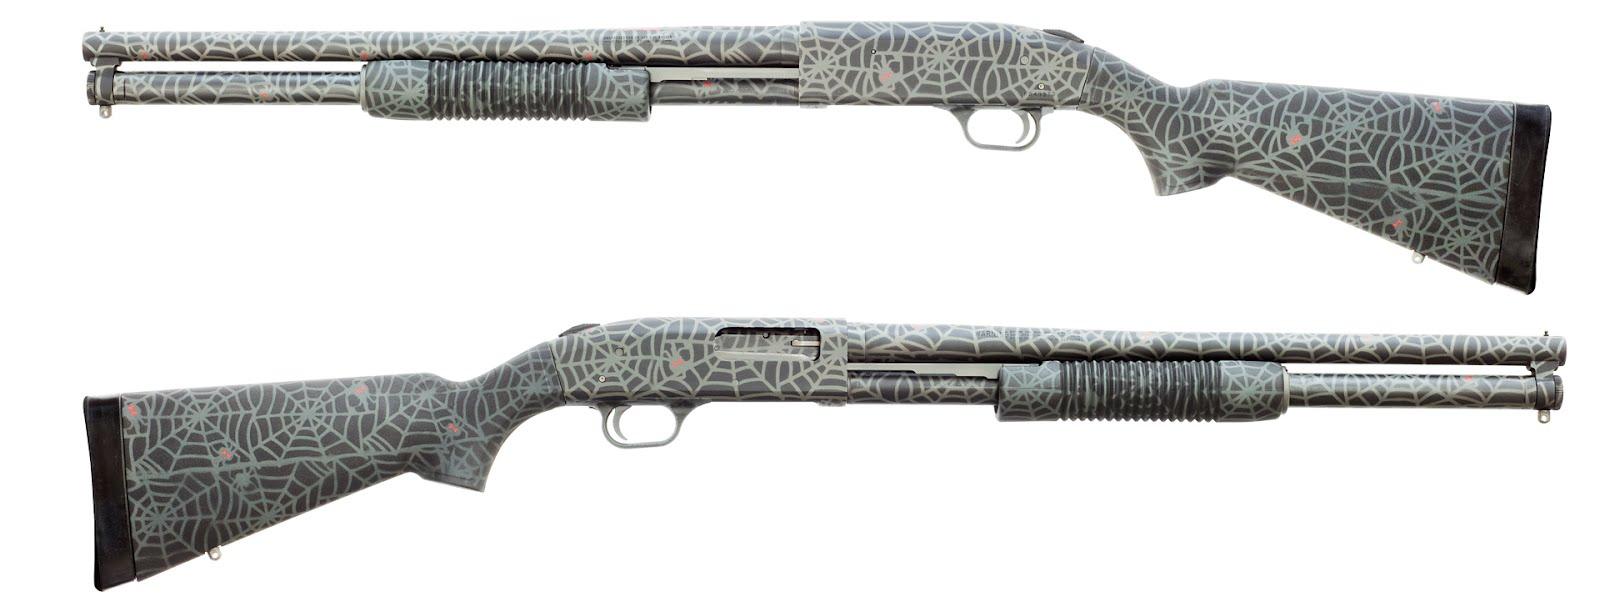 Drawn shotgun Patriots: III Class Shotgun Patch